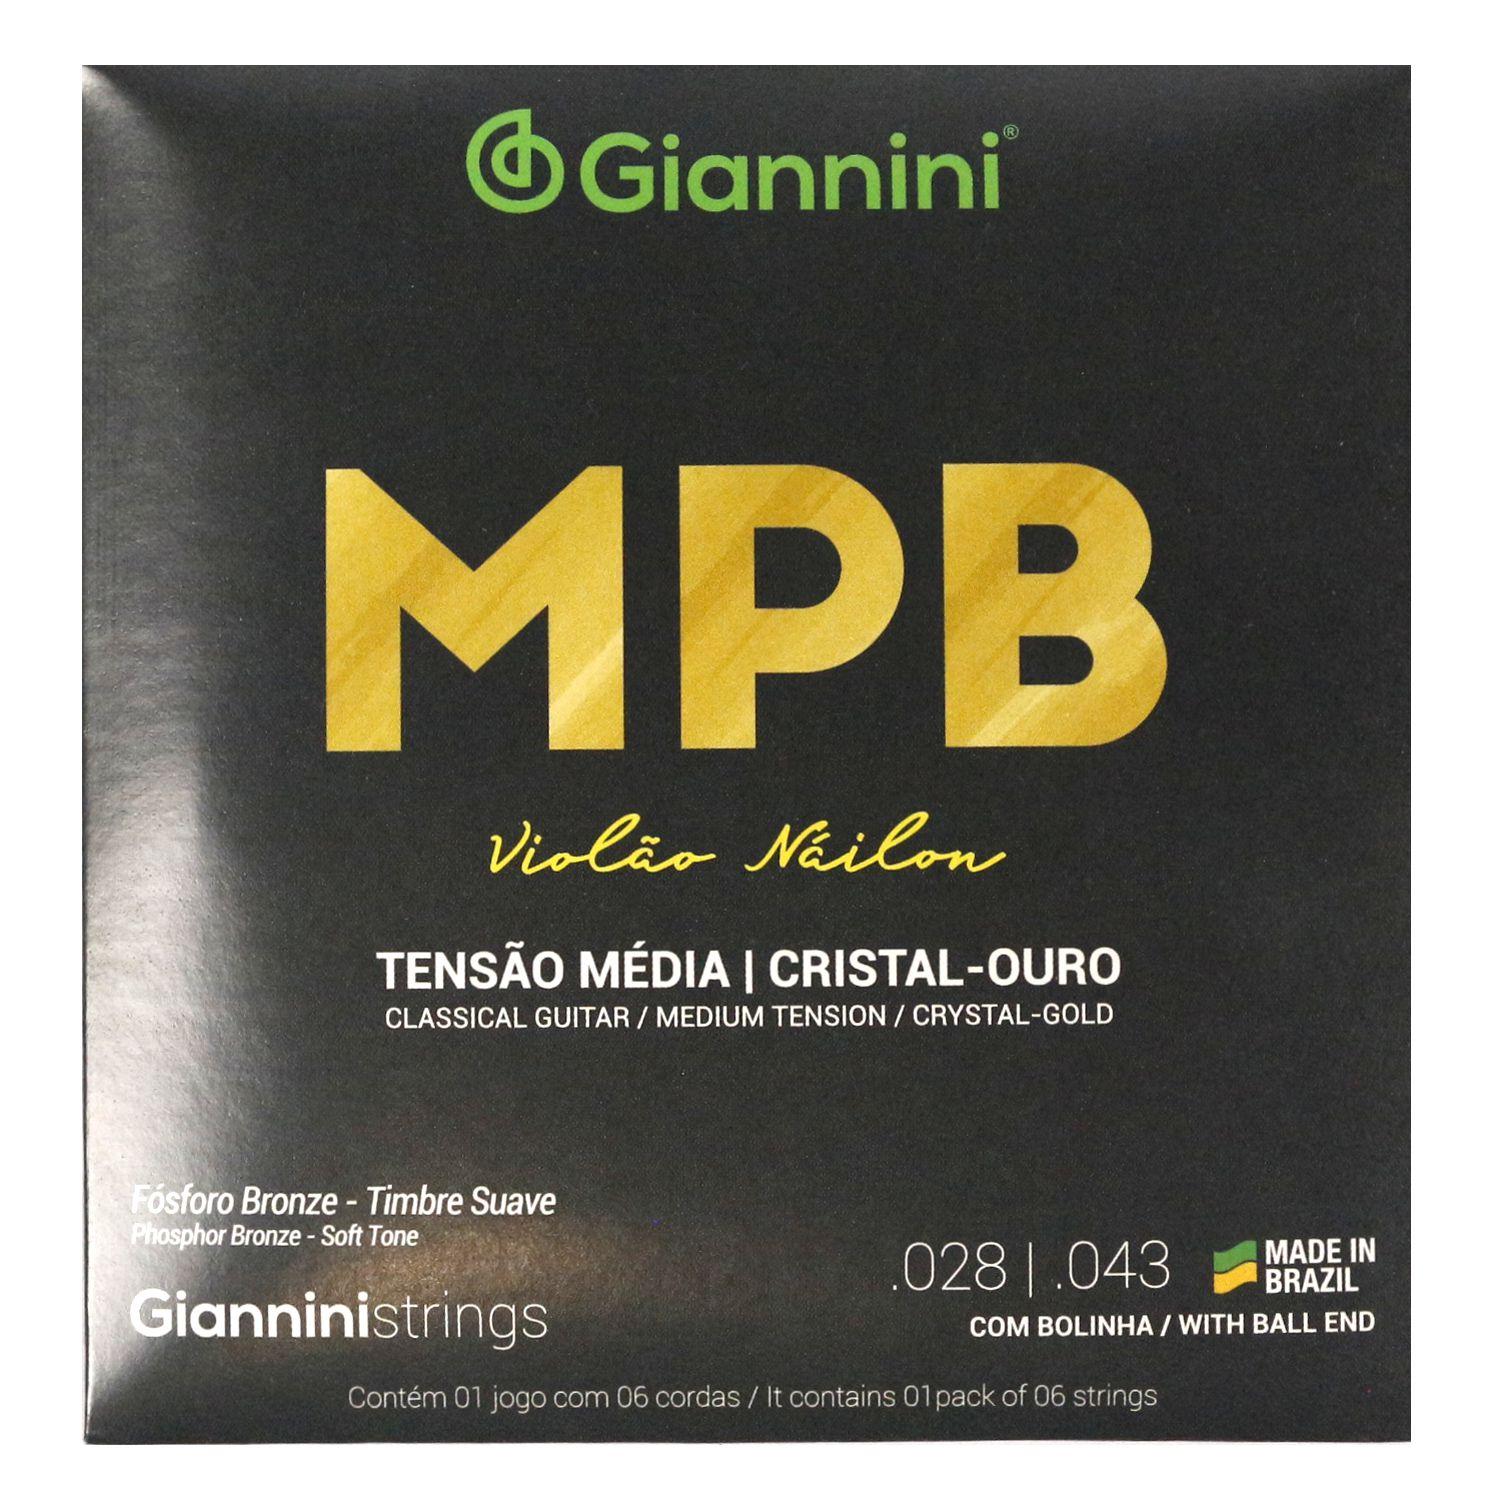 Encordoamento Giannini MPB Violão NYLON - Cordas de NYLON Cistal Ouro para Violão - GENWG